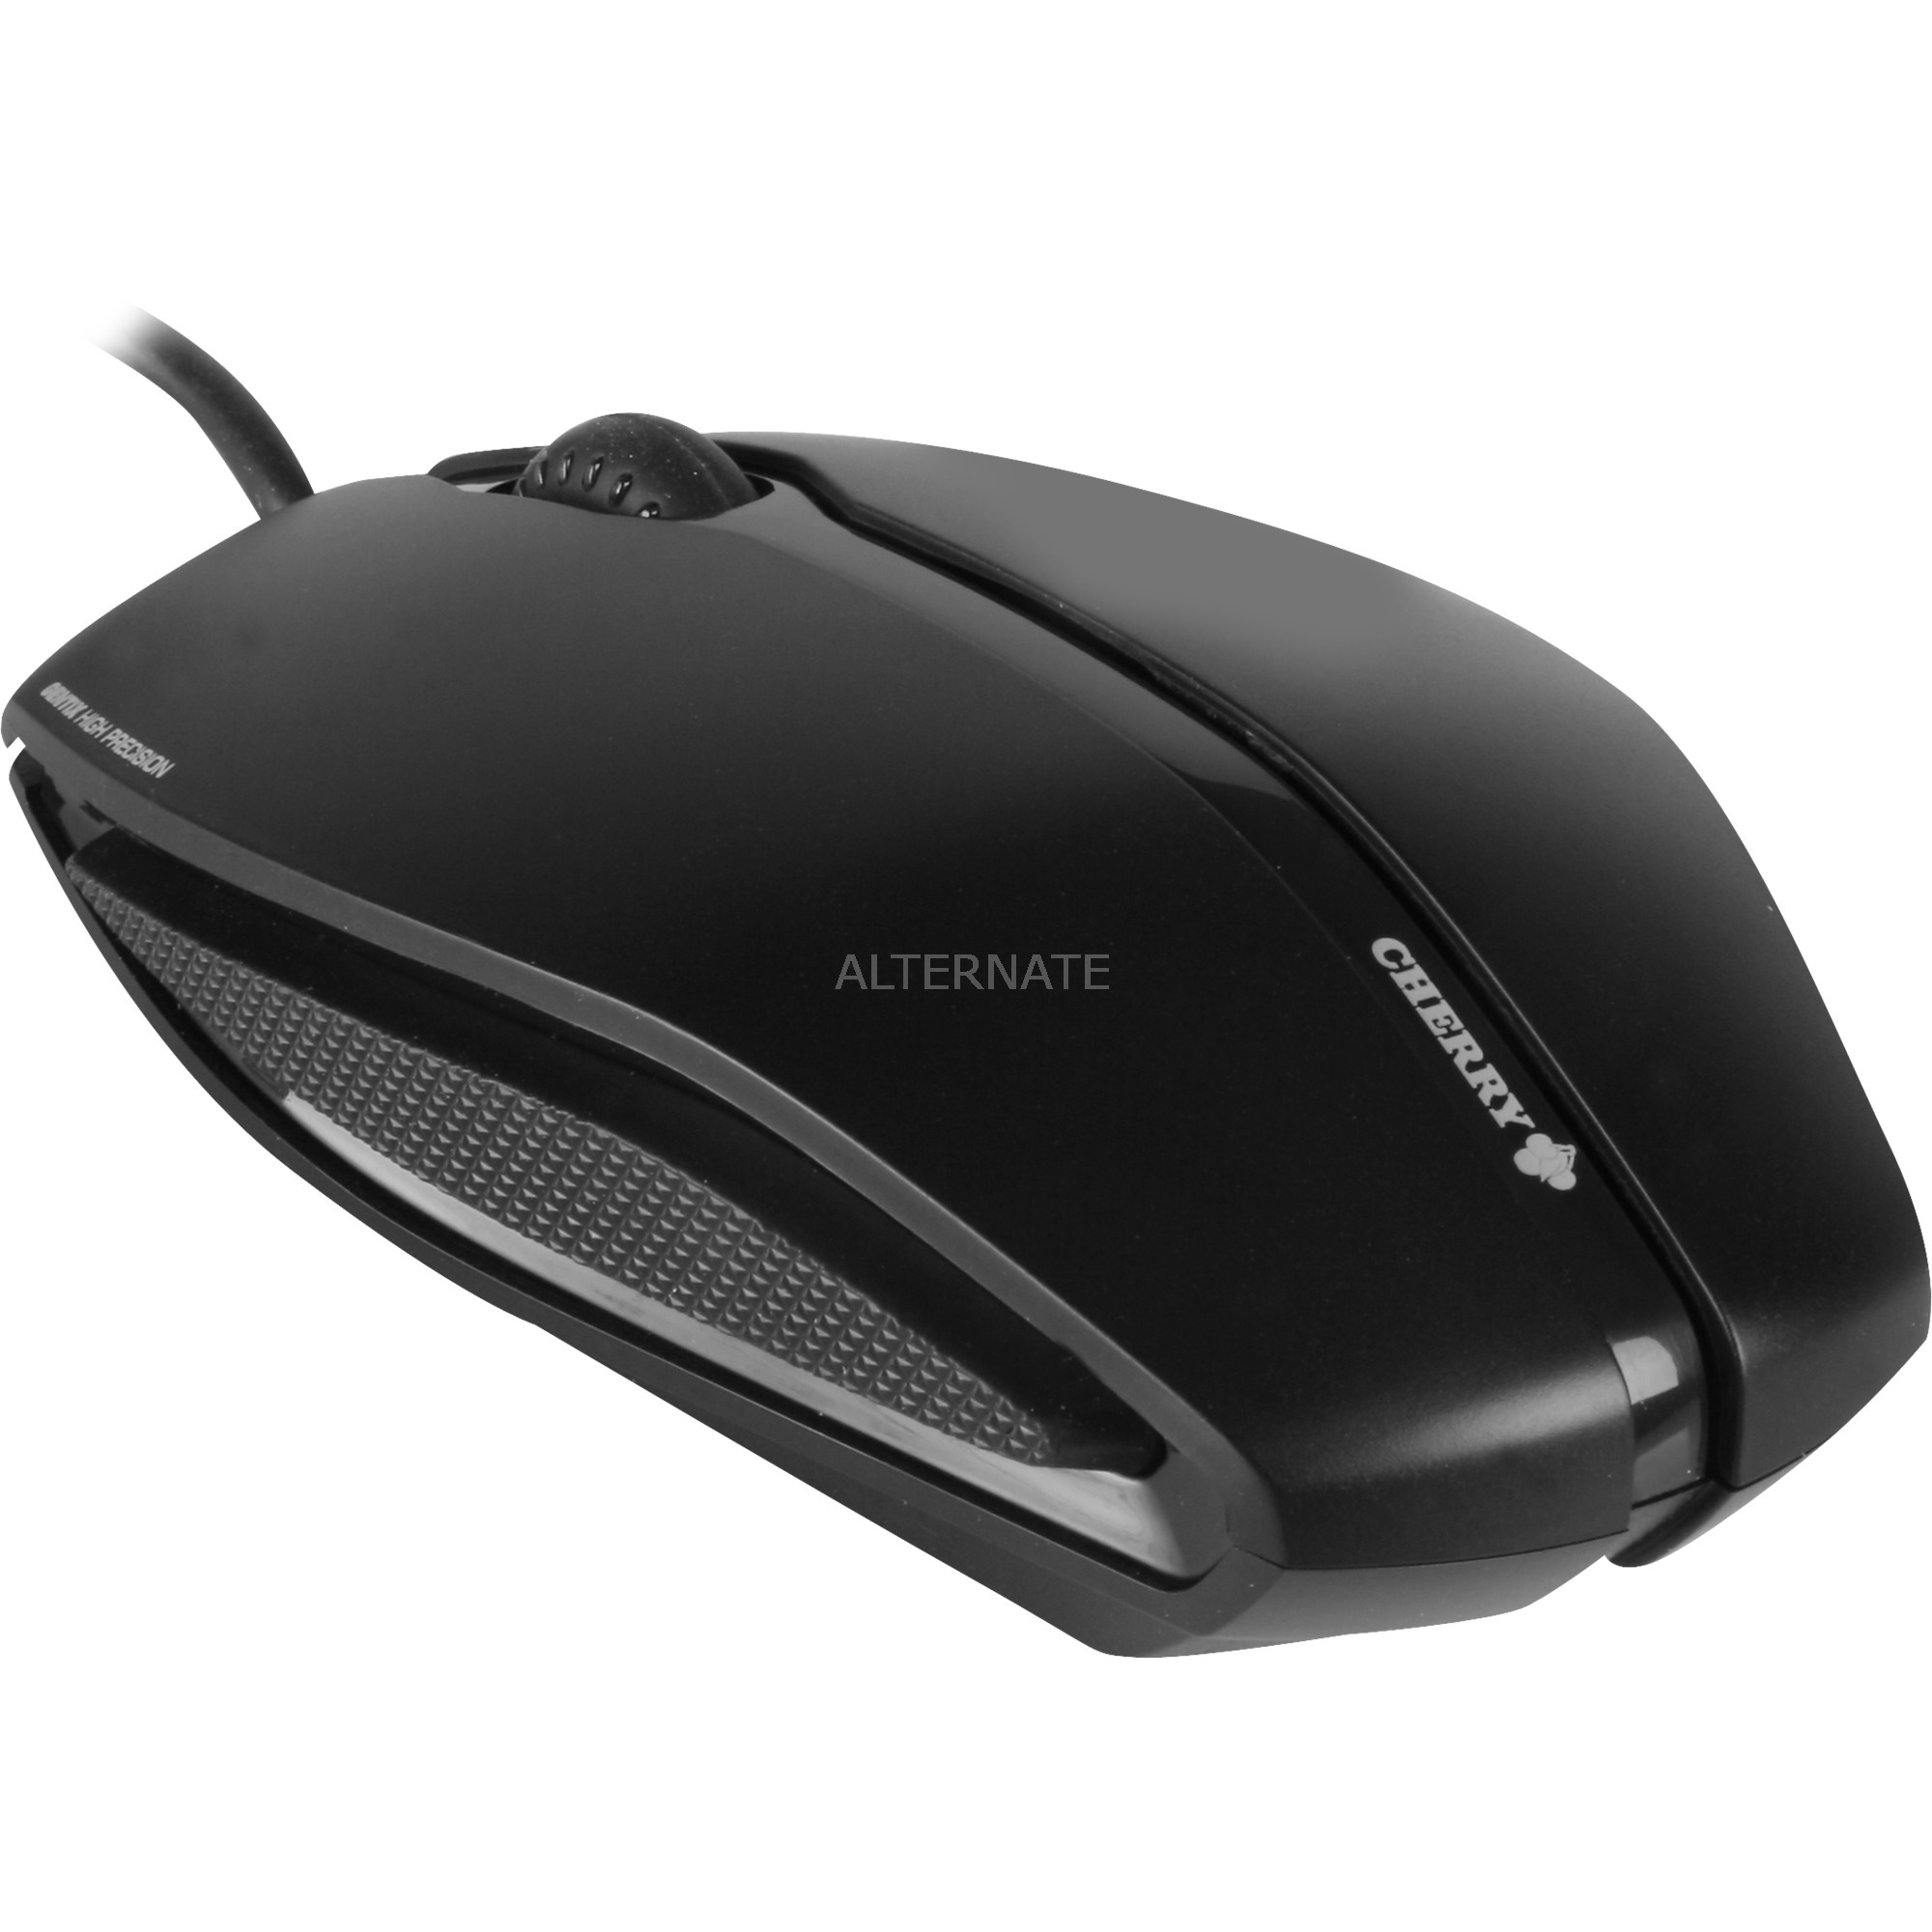 Gentix USB Óptico 1000DPI Ambidextro Negro ratón